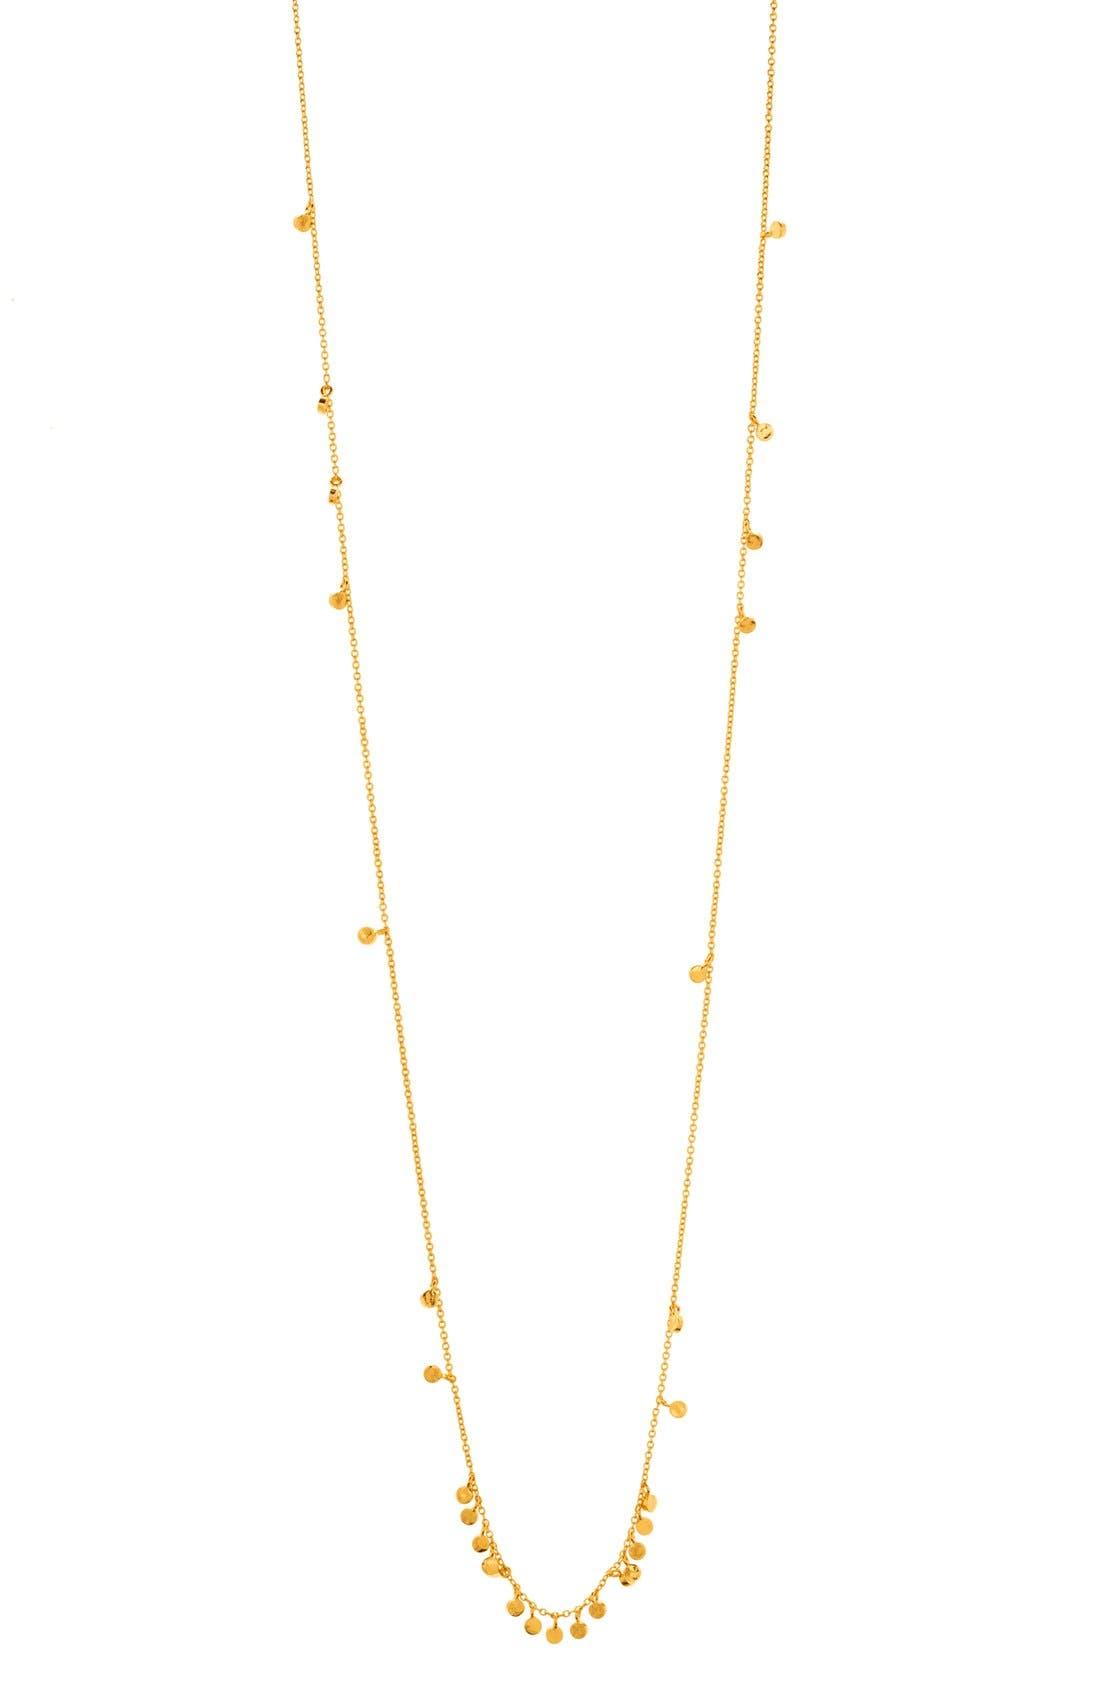 Main Image - gorjana 'Chloe' Mini Long Necklace